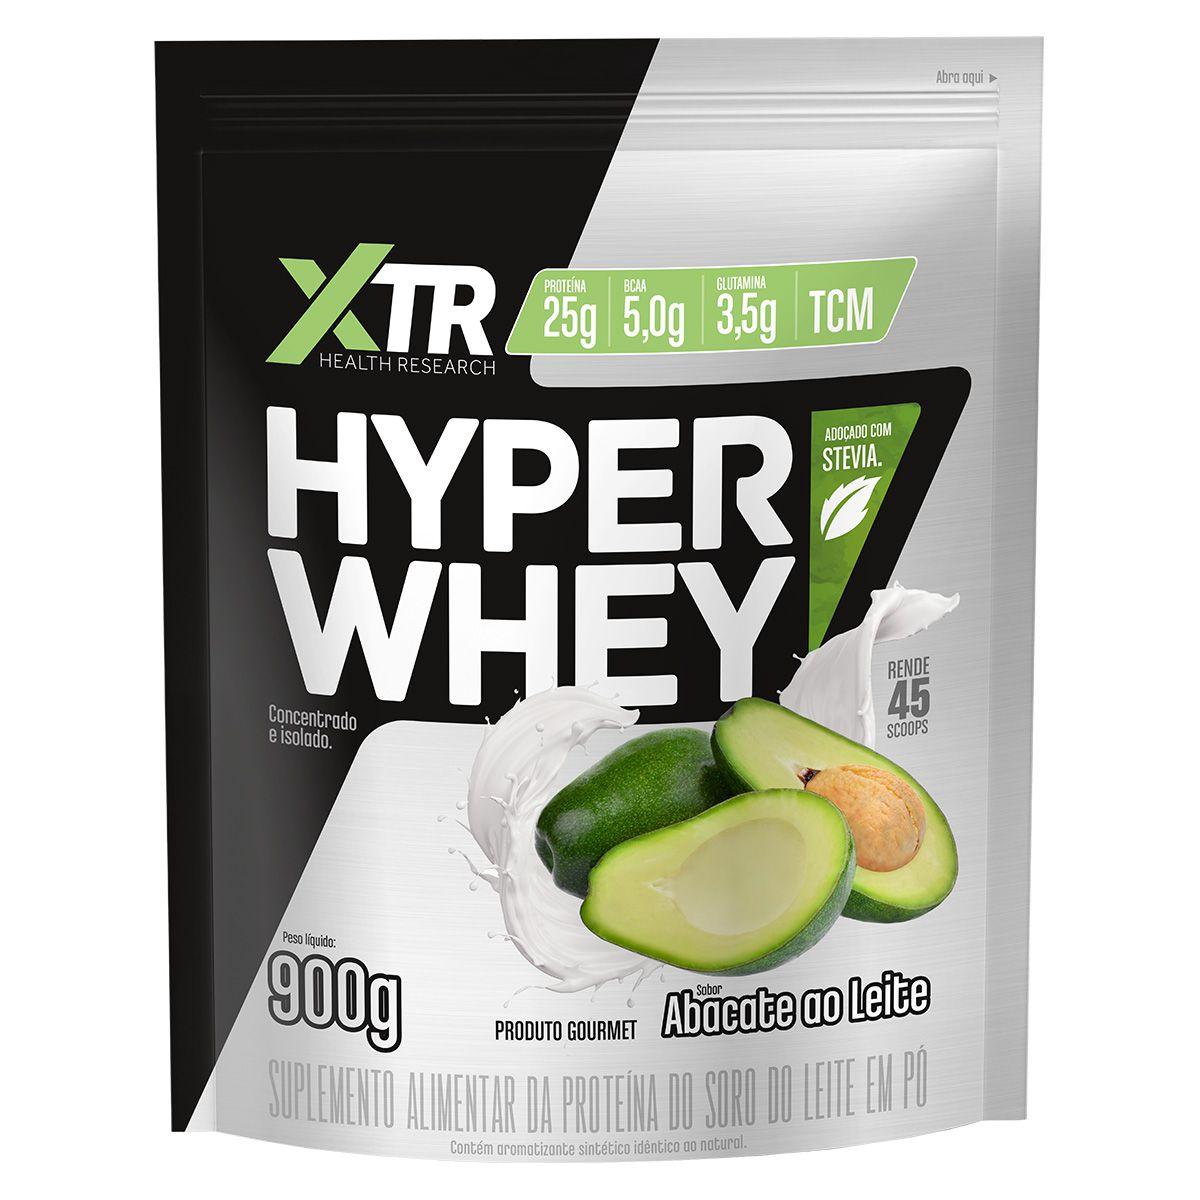 Hyper Whey 900g - XTR